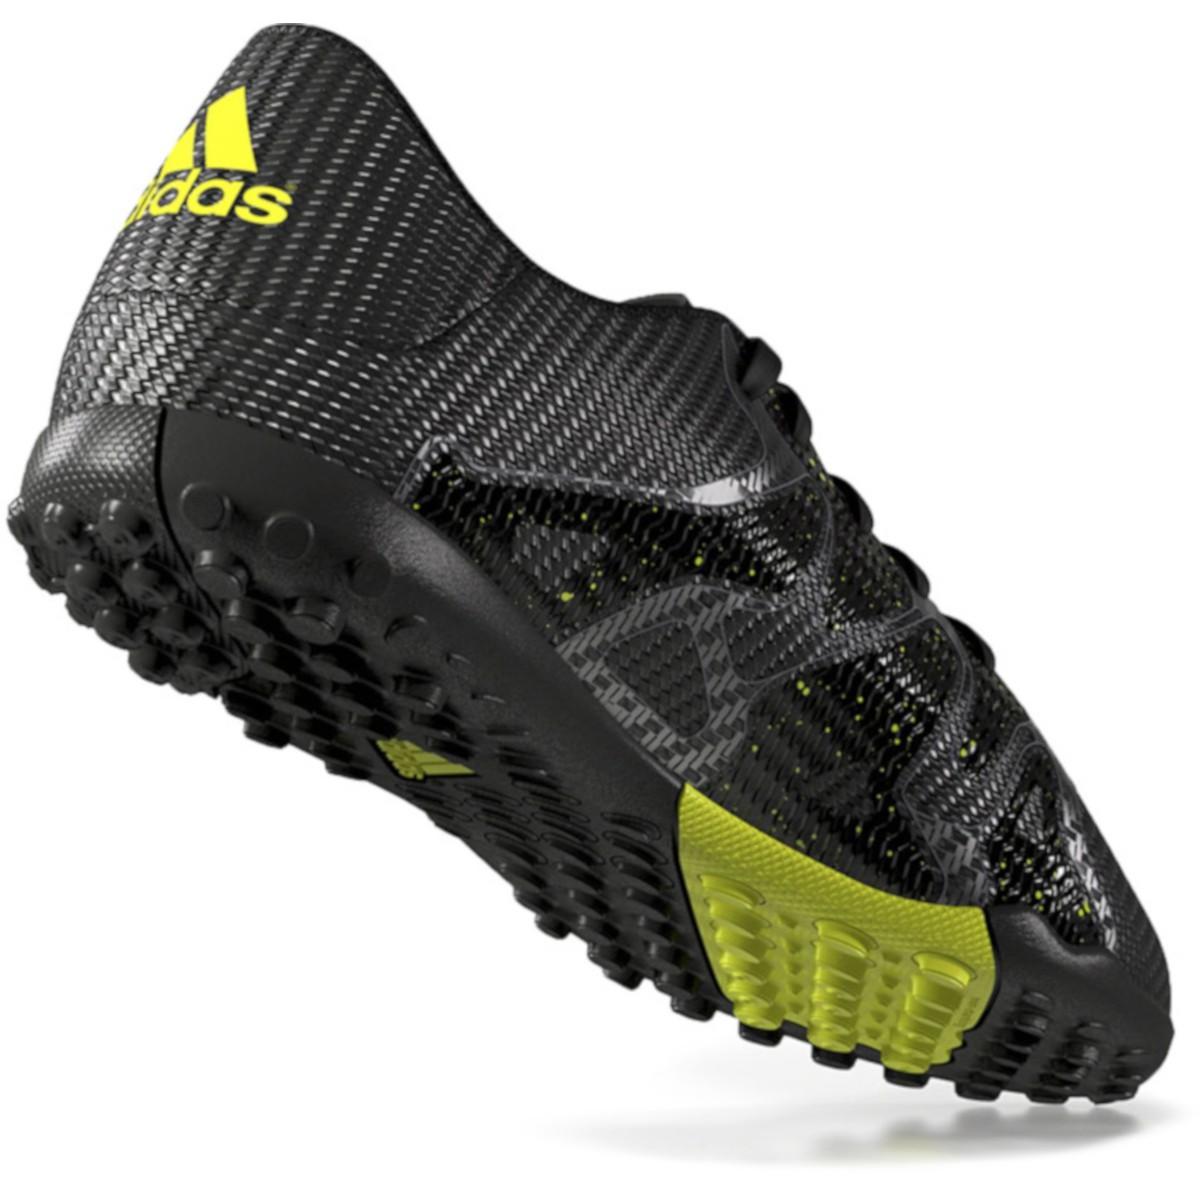 Buty Pi?karskie Adidas X 15.4 Tf Junior B32951 R.37 13 |